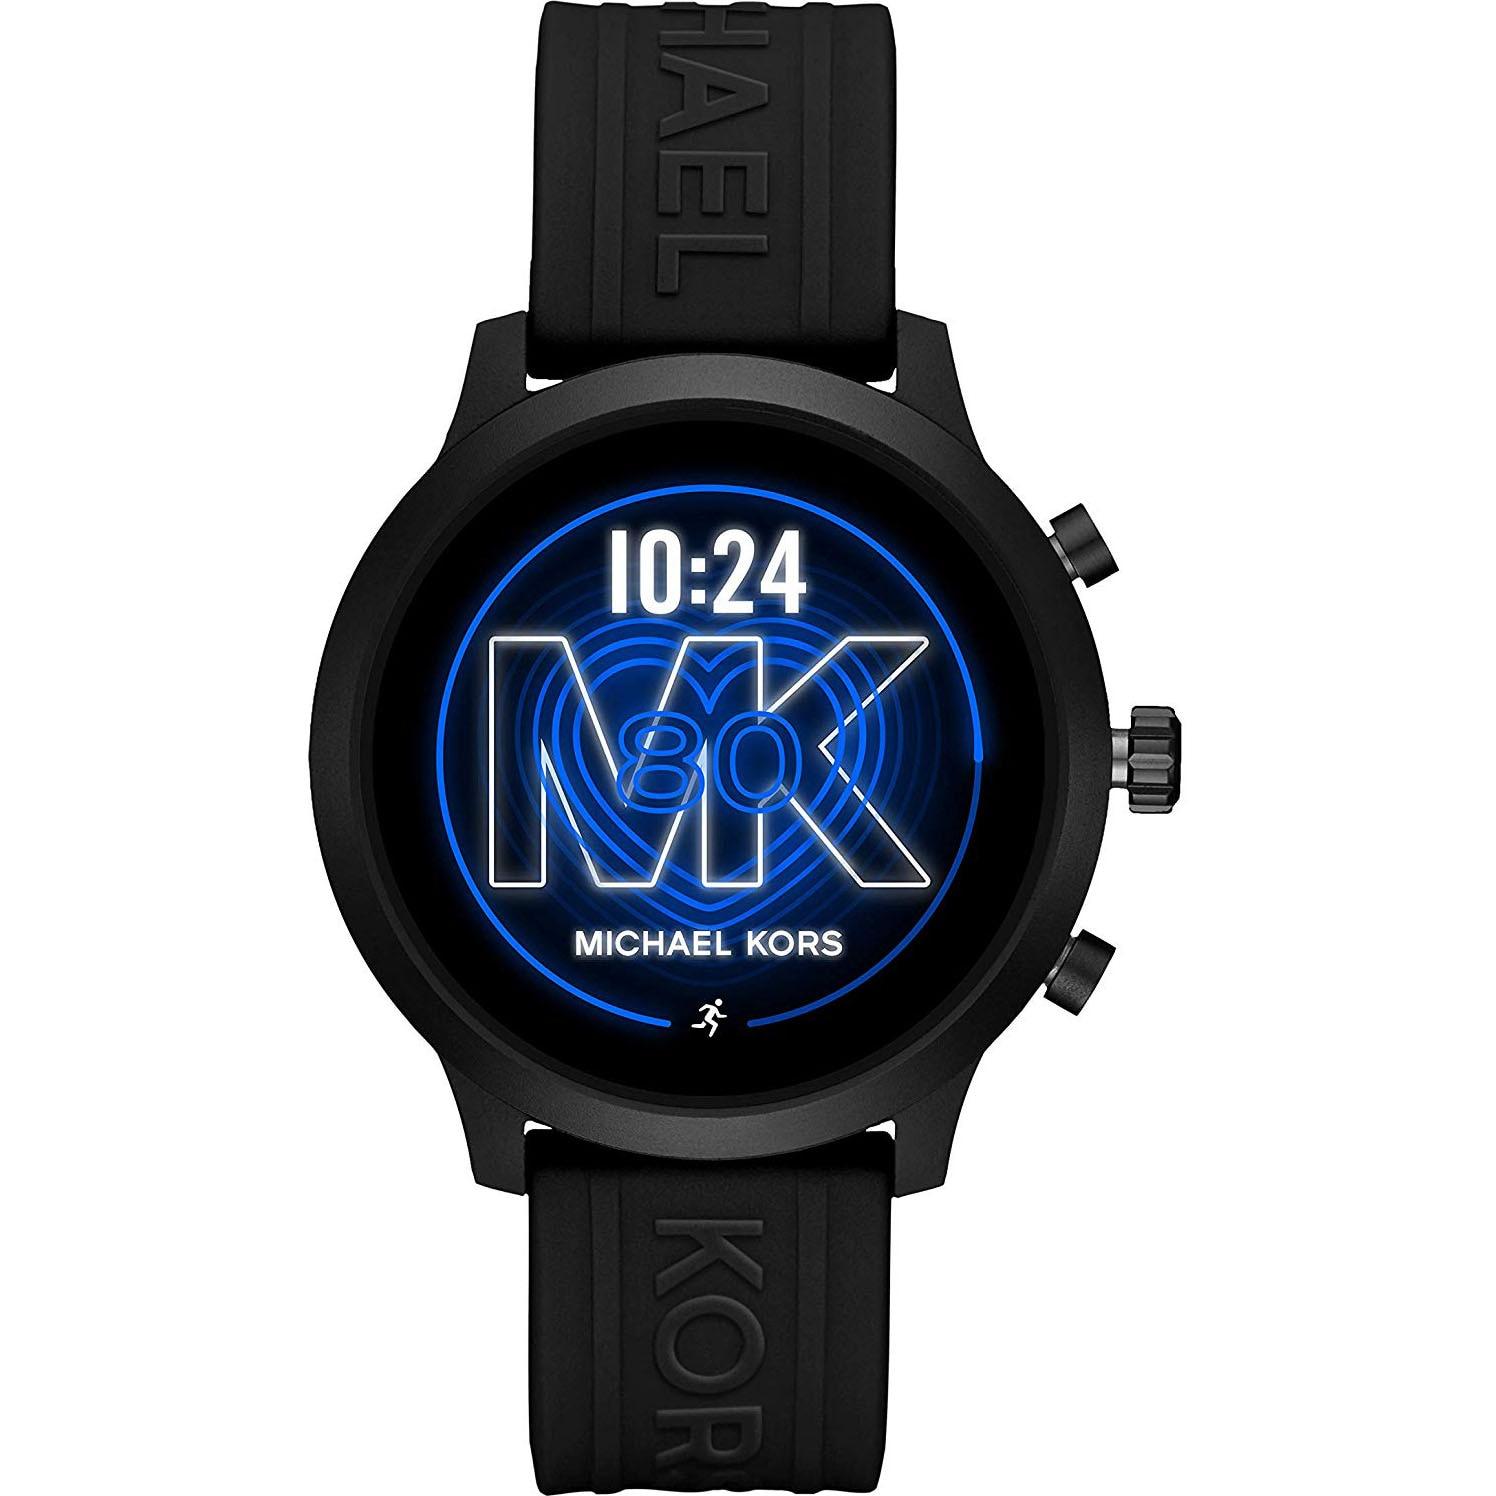 Fotografie Ceas Smartwatch Michael Kors GO, MKT5072, Silicon, Black/Black